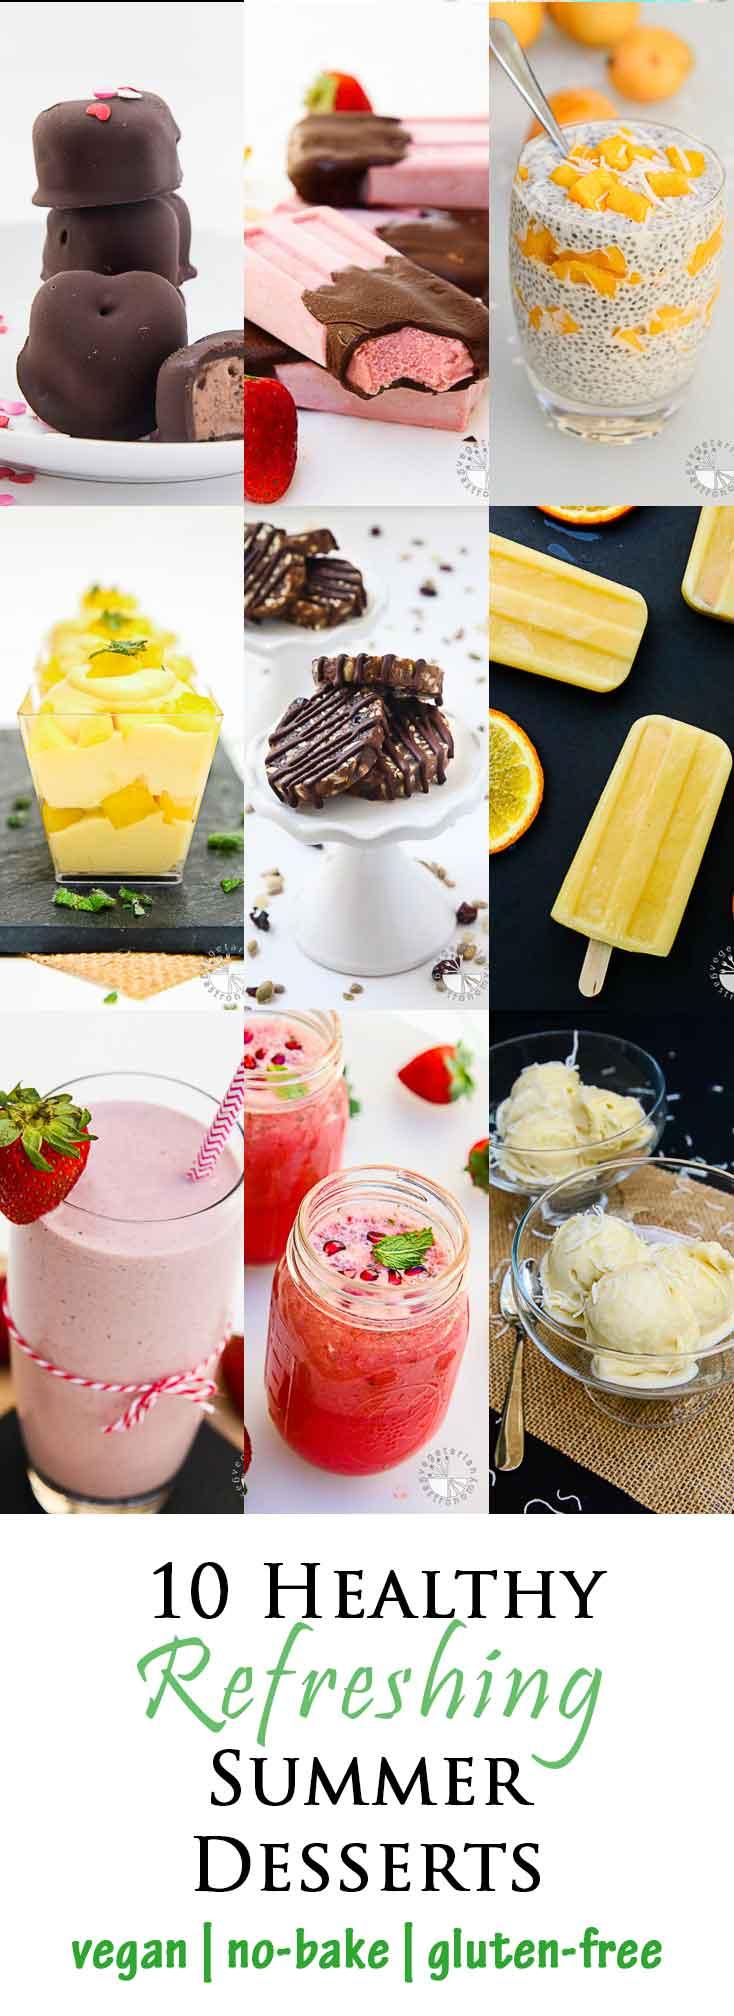 Healthy Refreshing Vegan Summer Desserts #vegan #glutenfree | www.vegetariangastronomy.com | Vegetarian Gastronomy